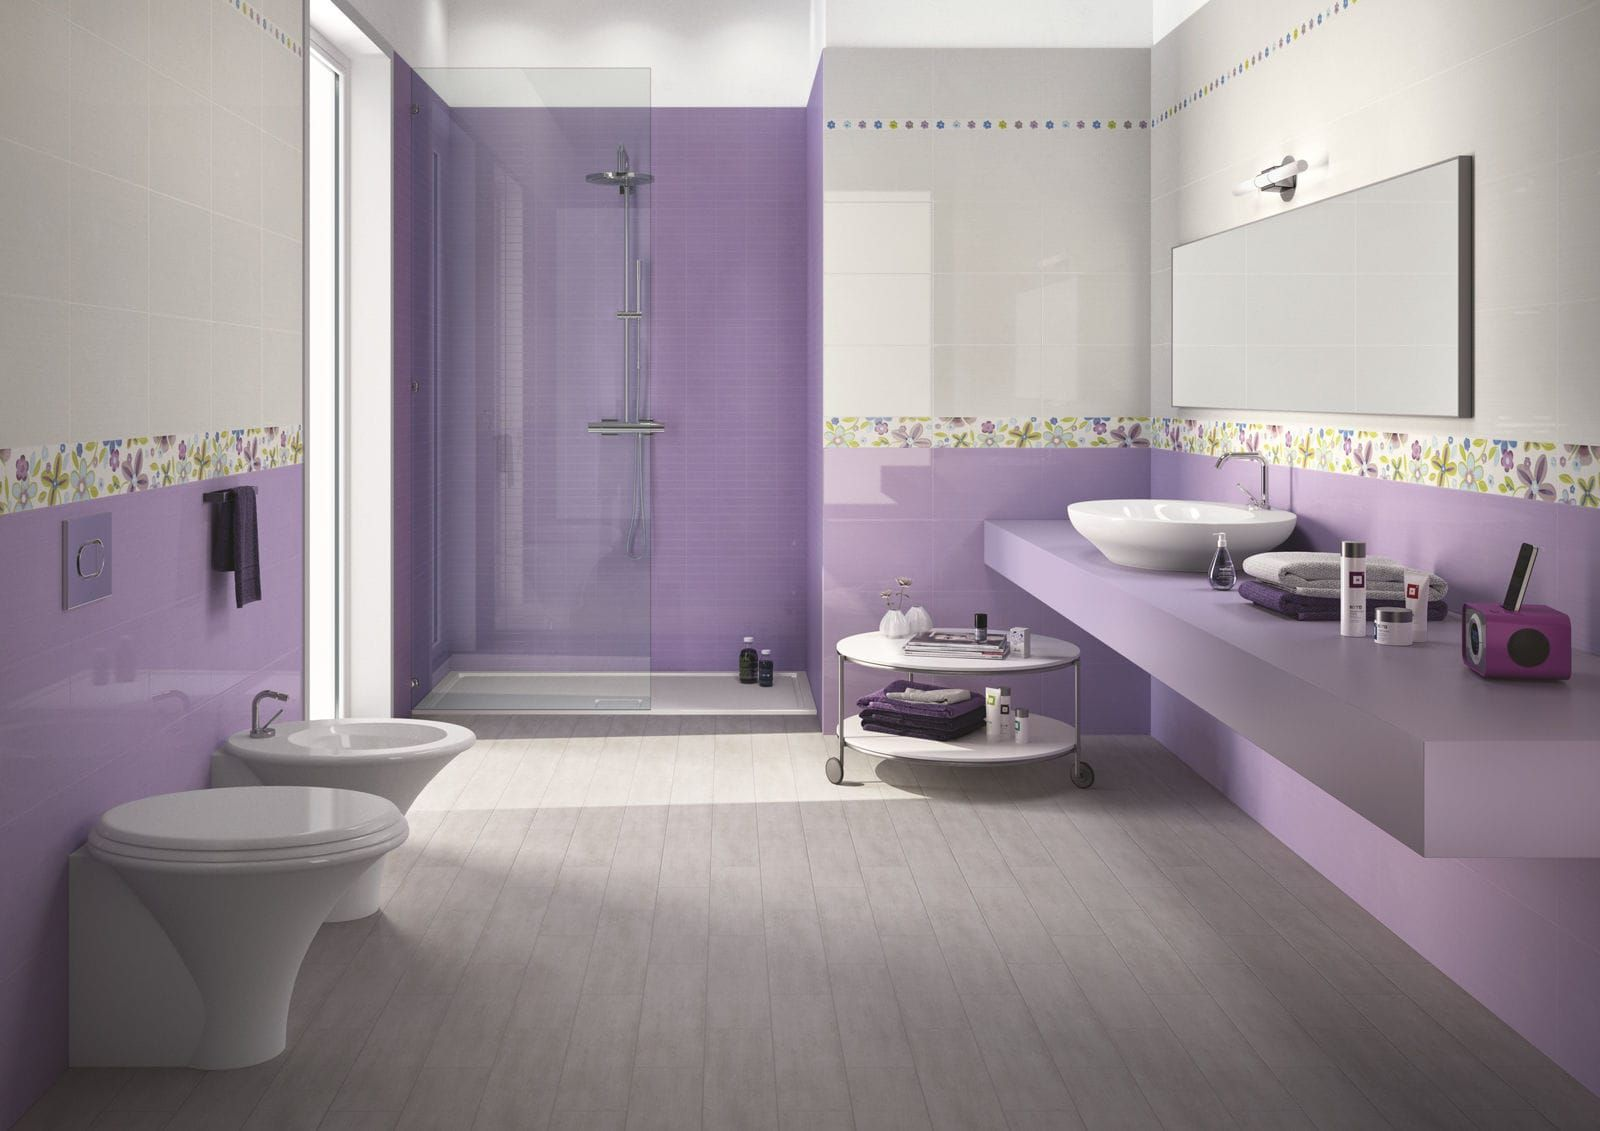 Carrelage de salle de bain mural en c ramique for Carrelage ceramique salle de bain